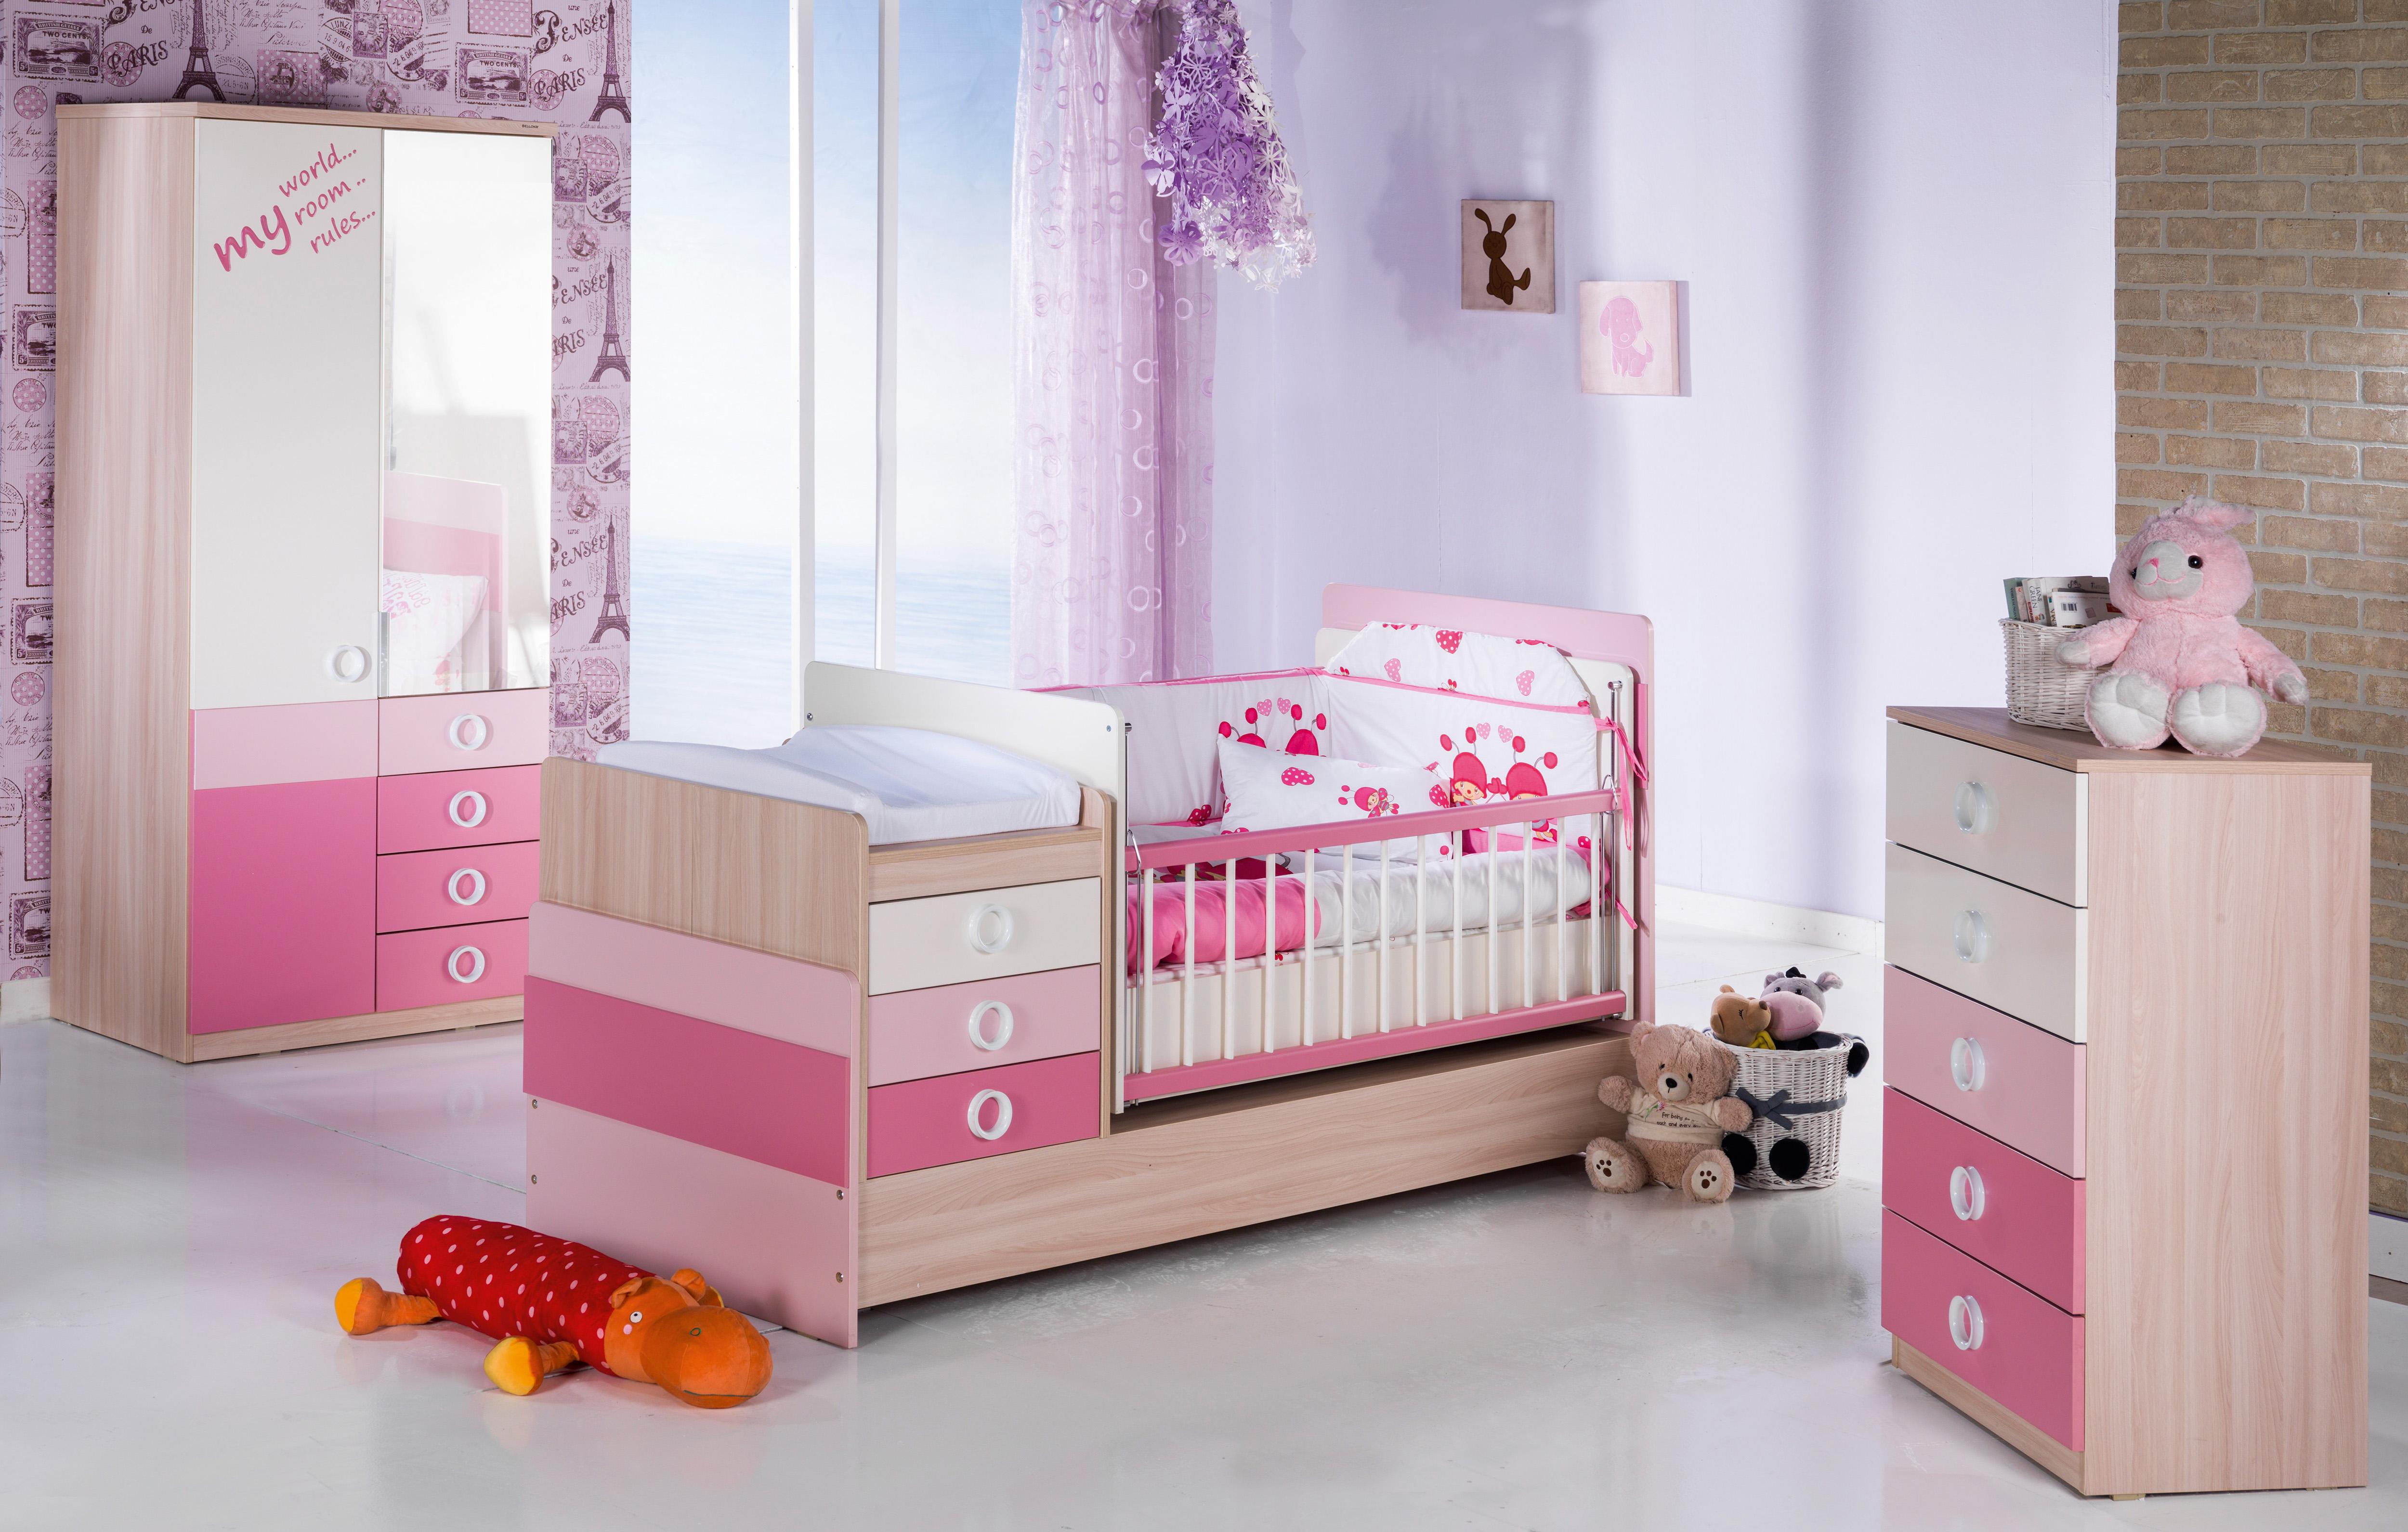 Portivo chambre enfant-1